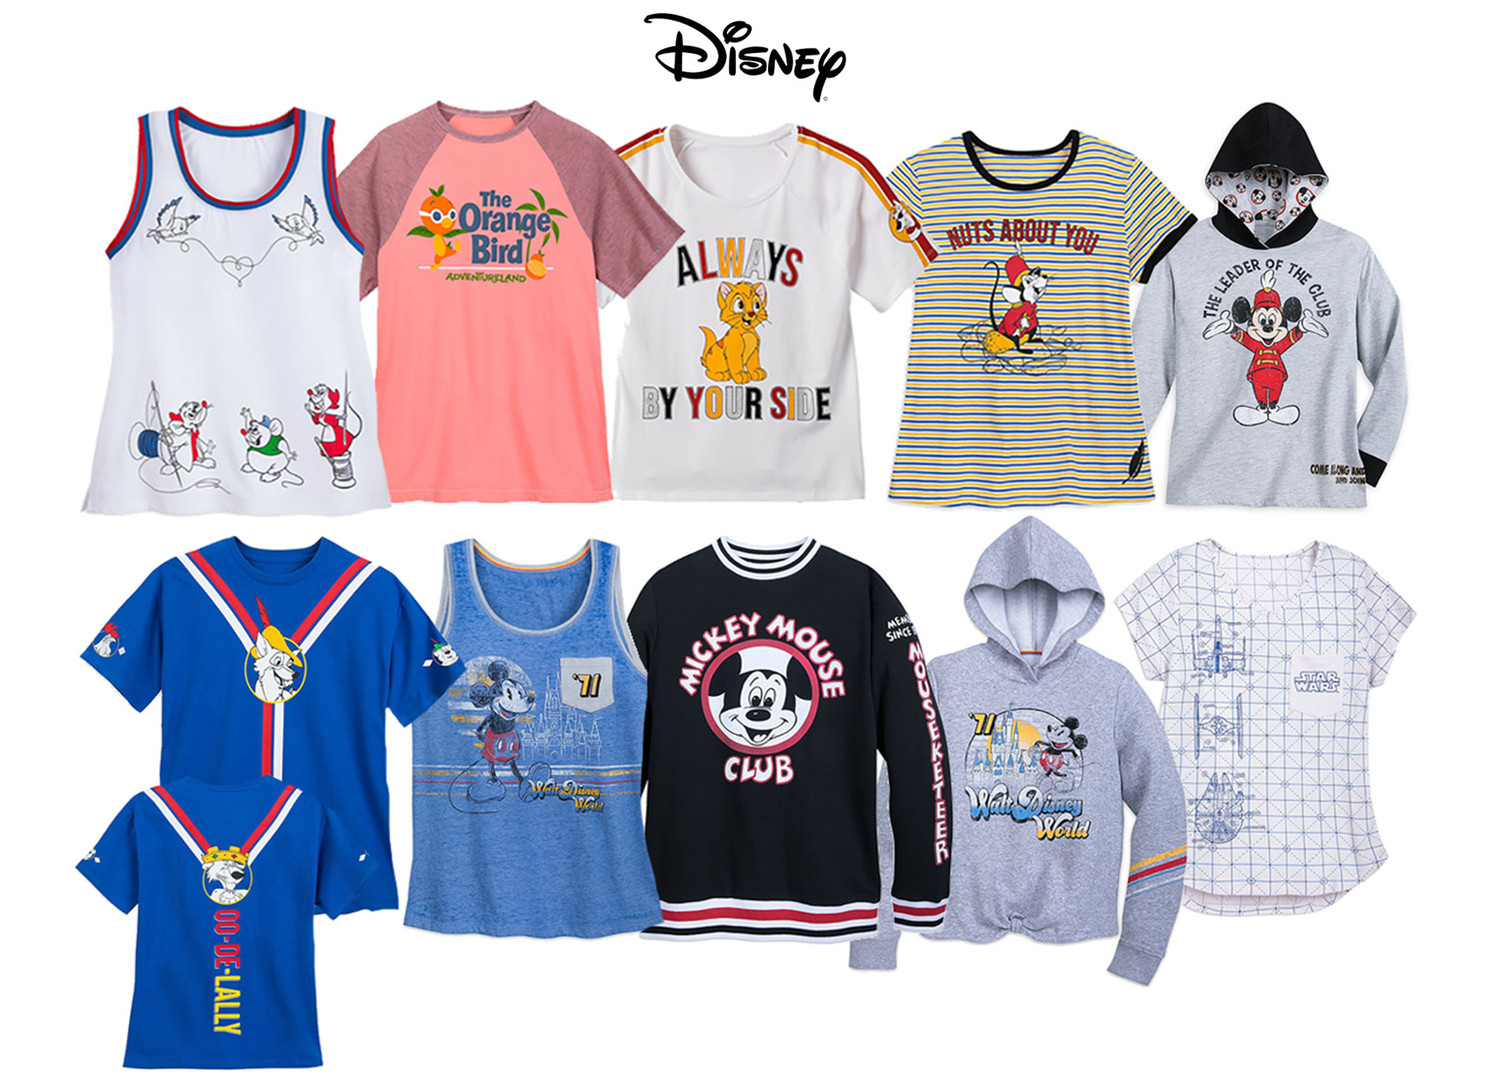 Art development & design of various women's graphic tops sold at Disney Parks & Resort and shopdisney.com